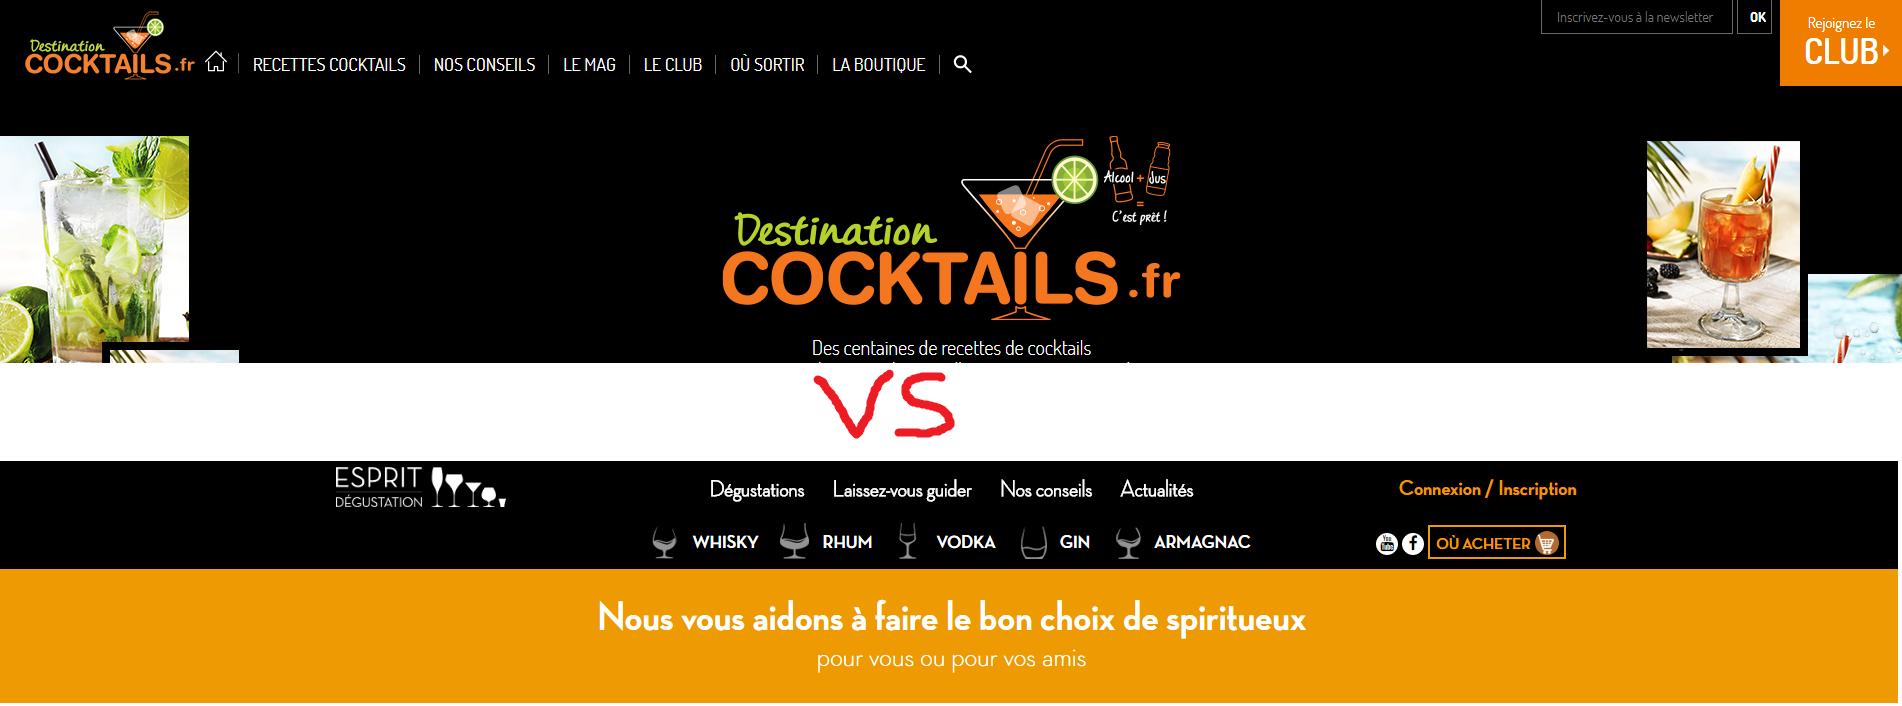 esprit degustation vs destination cocktail